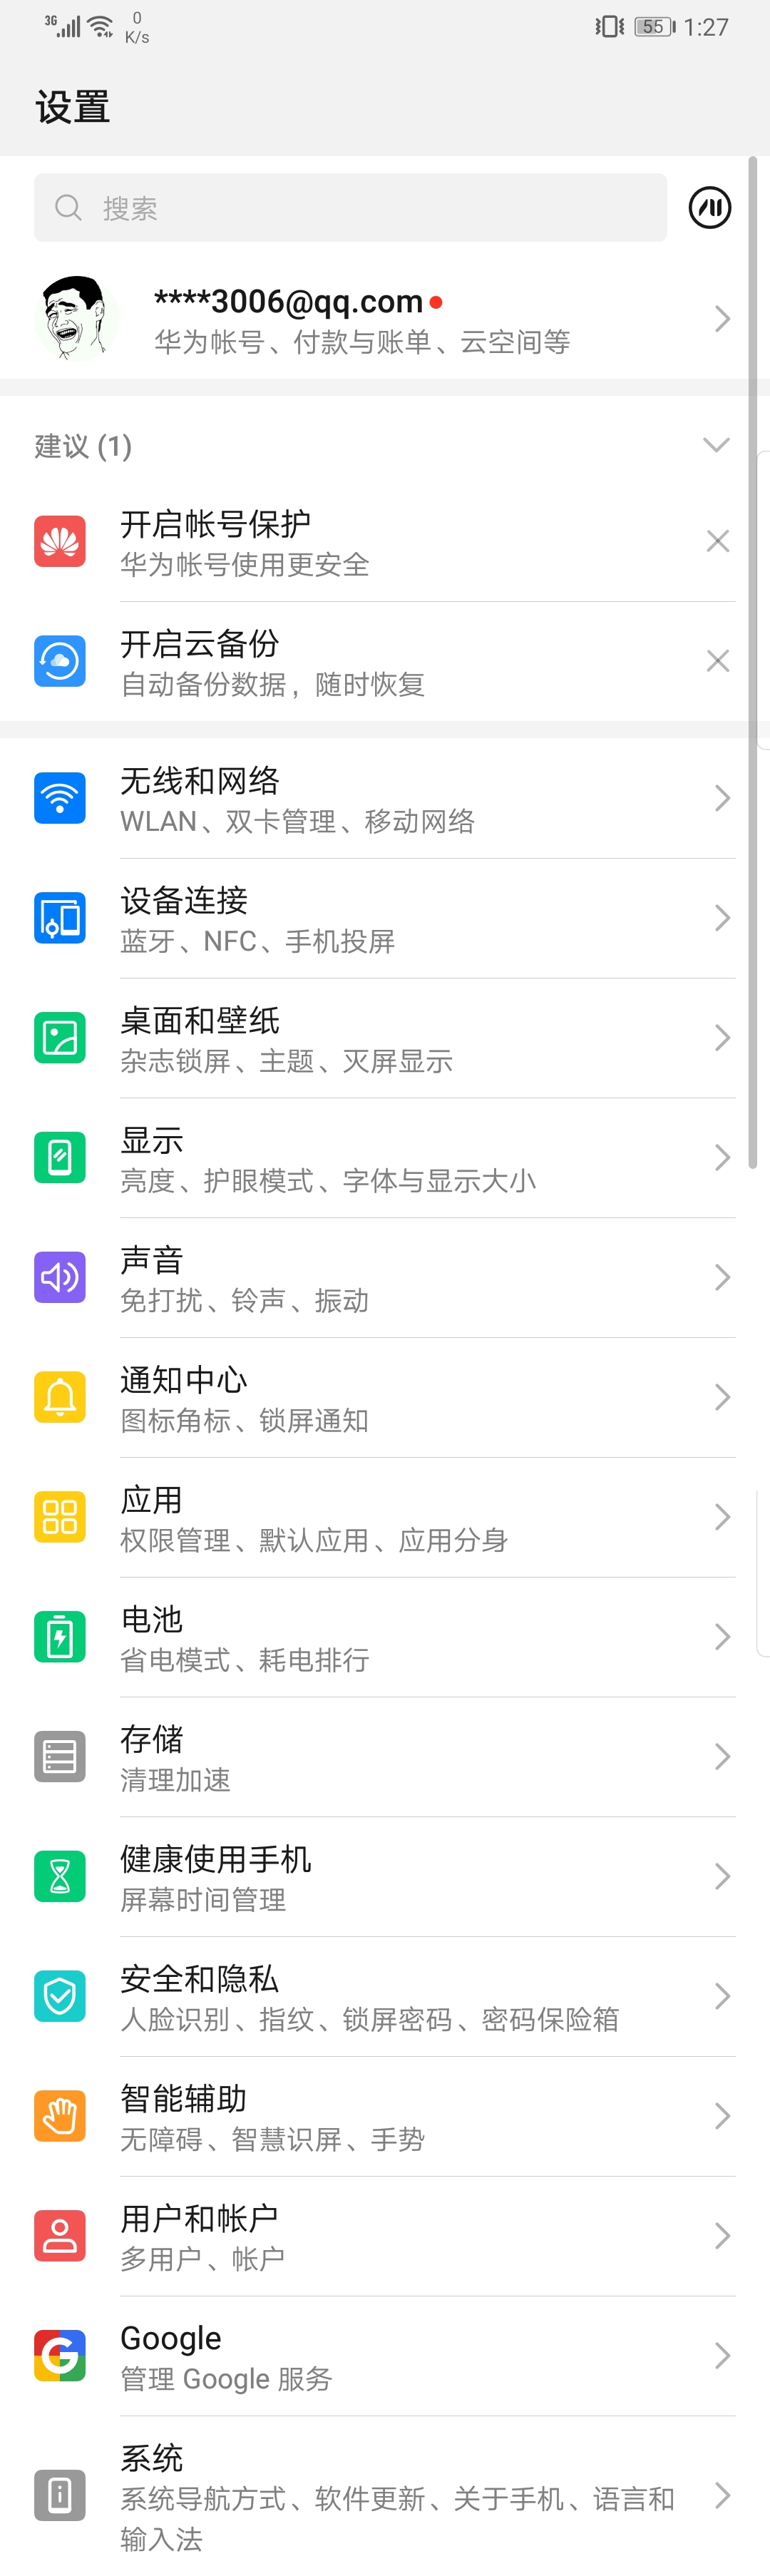 Screenshot_20190506_132727_com.android.settings.jpg